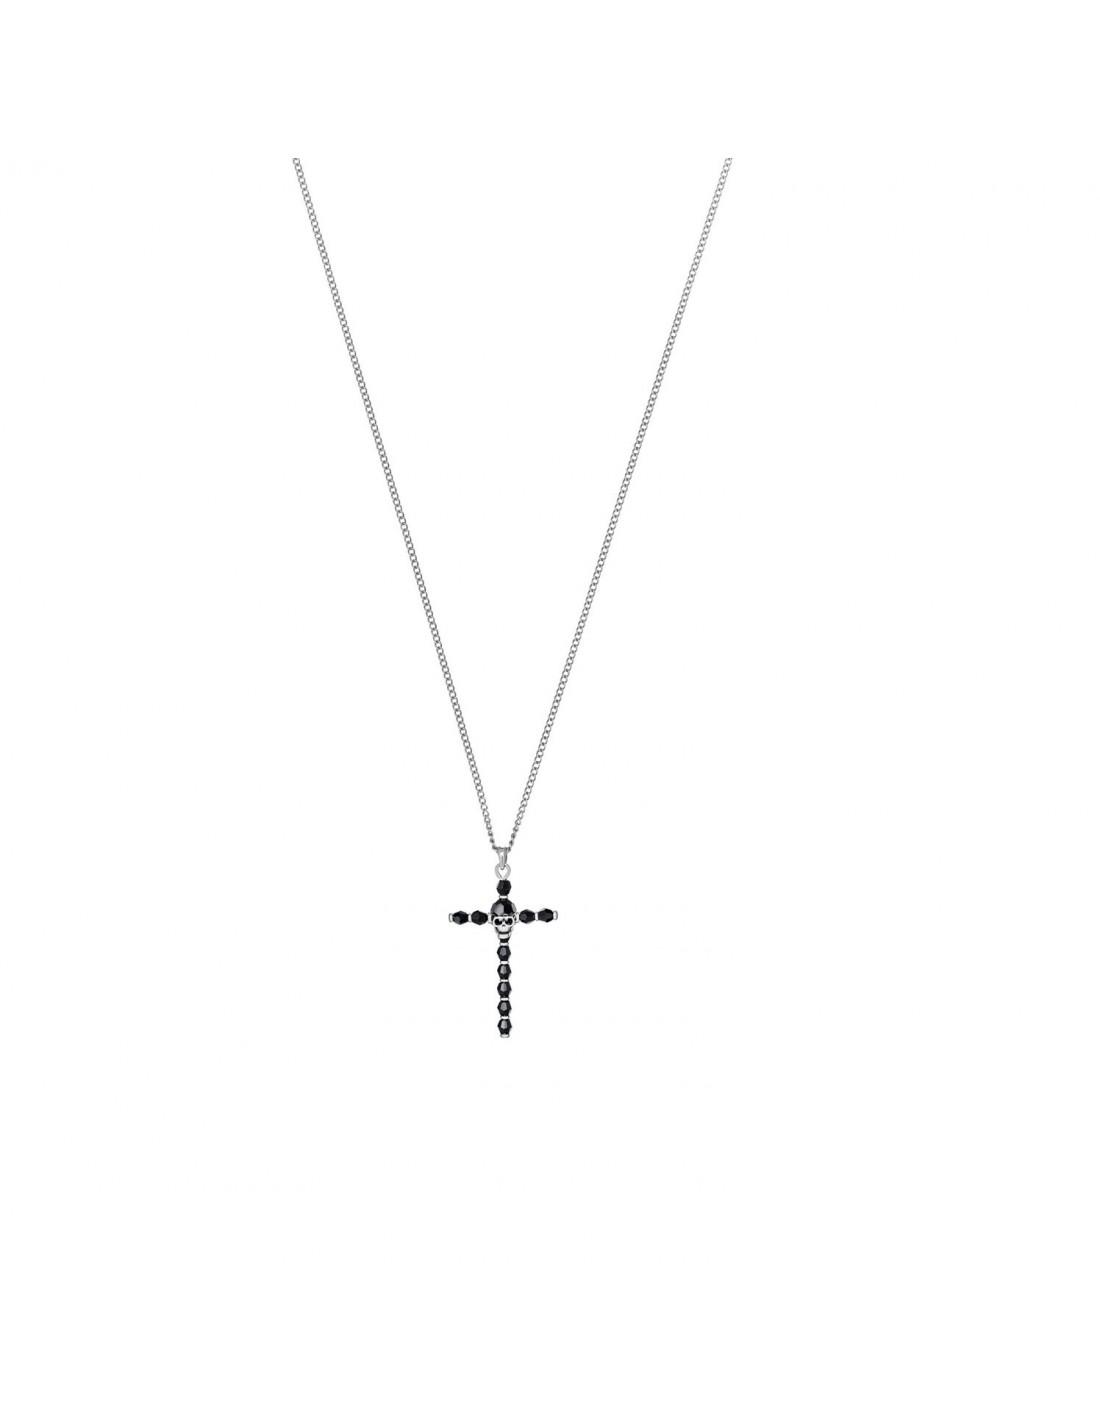 2d81336b055c1 Necklace Taddeo swarovski jewelry pendant for men 5429877